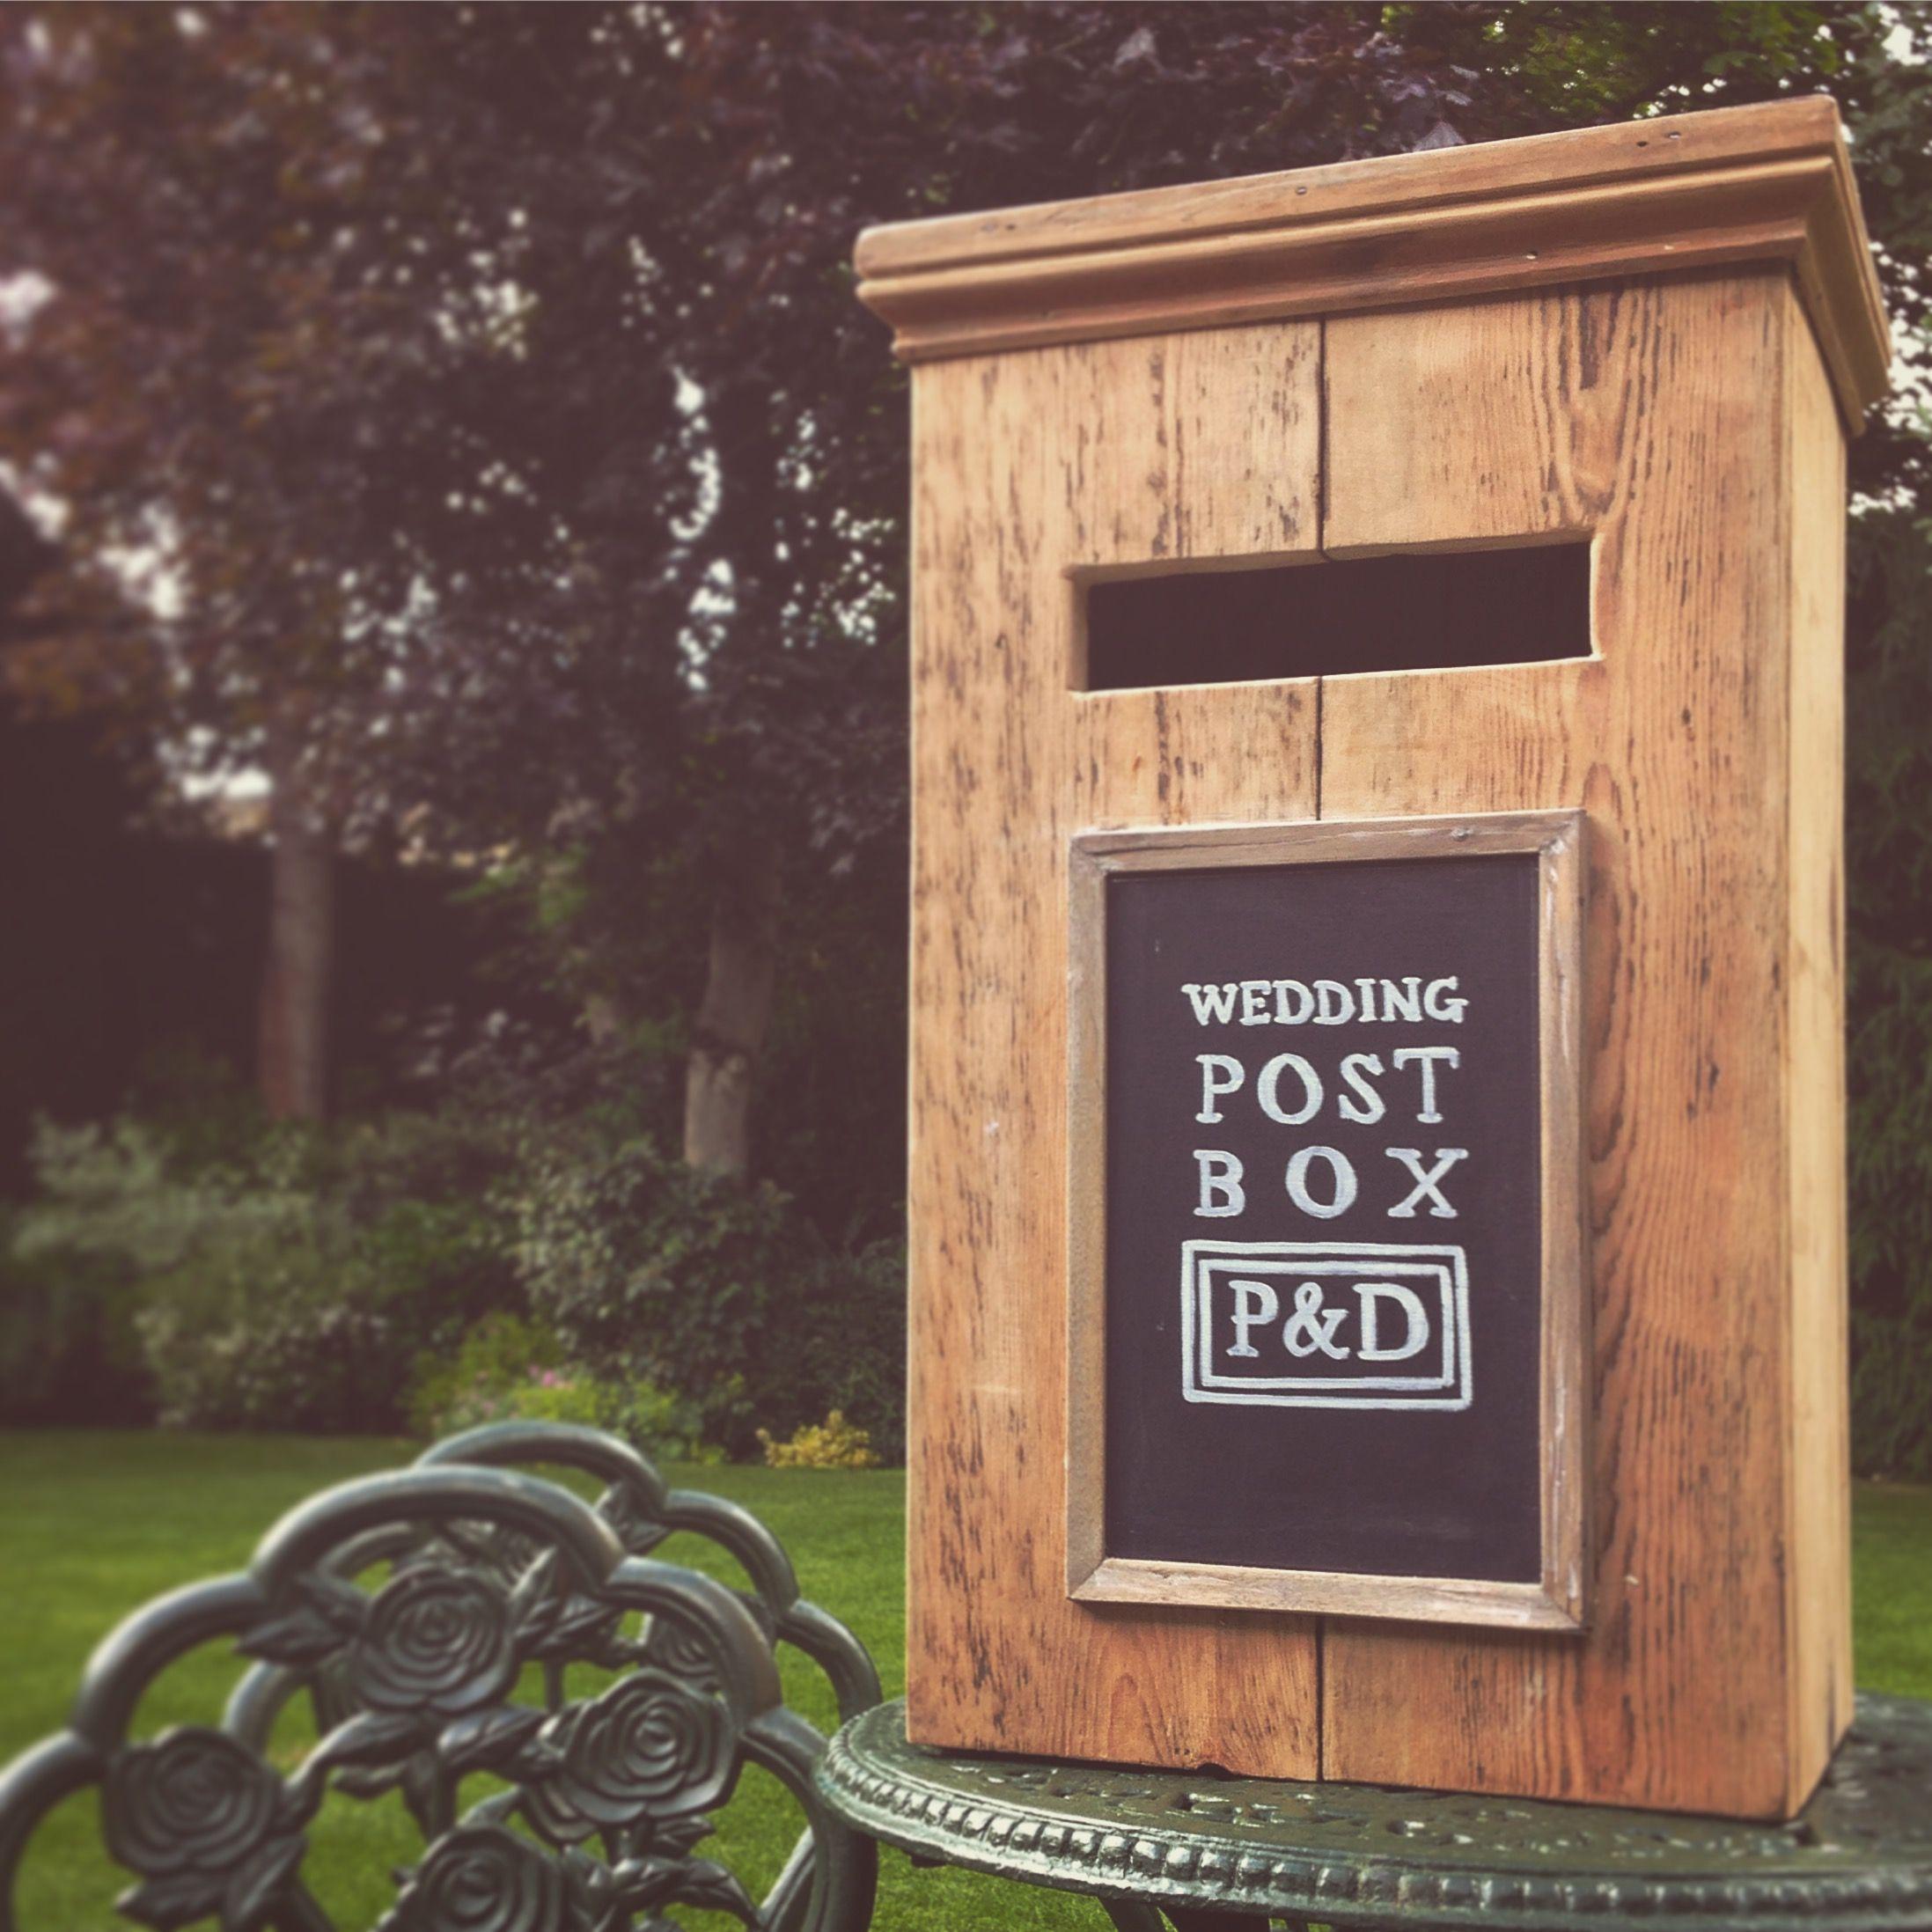 Post Wedding Gifts: Rustic Wedding Post Box